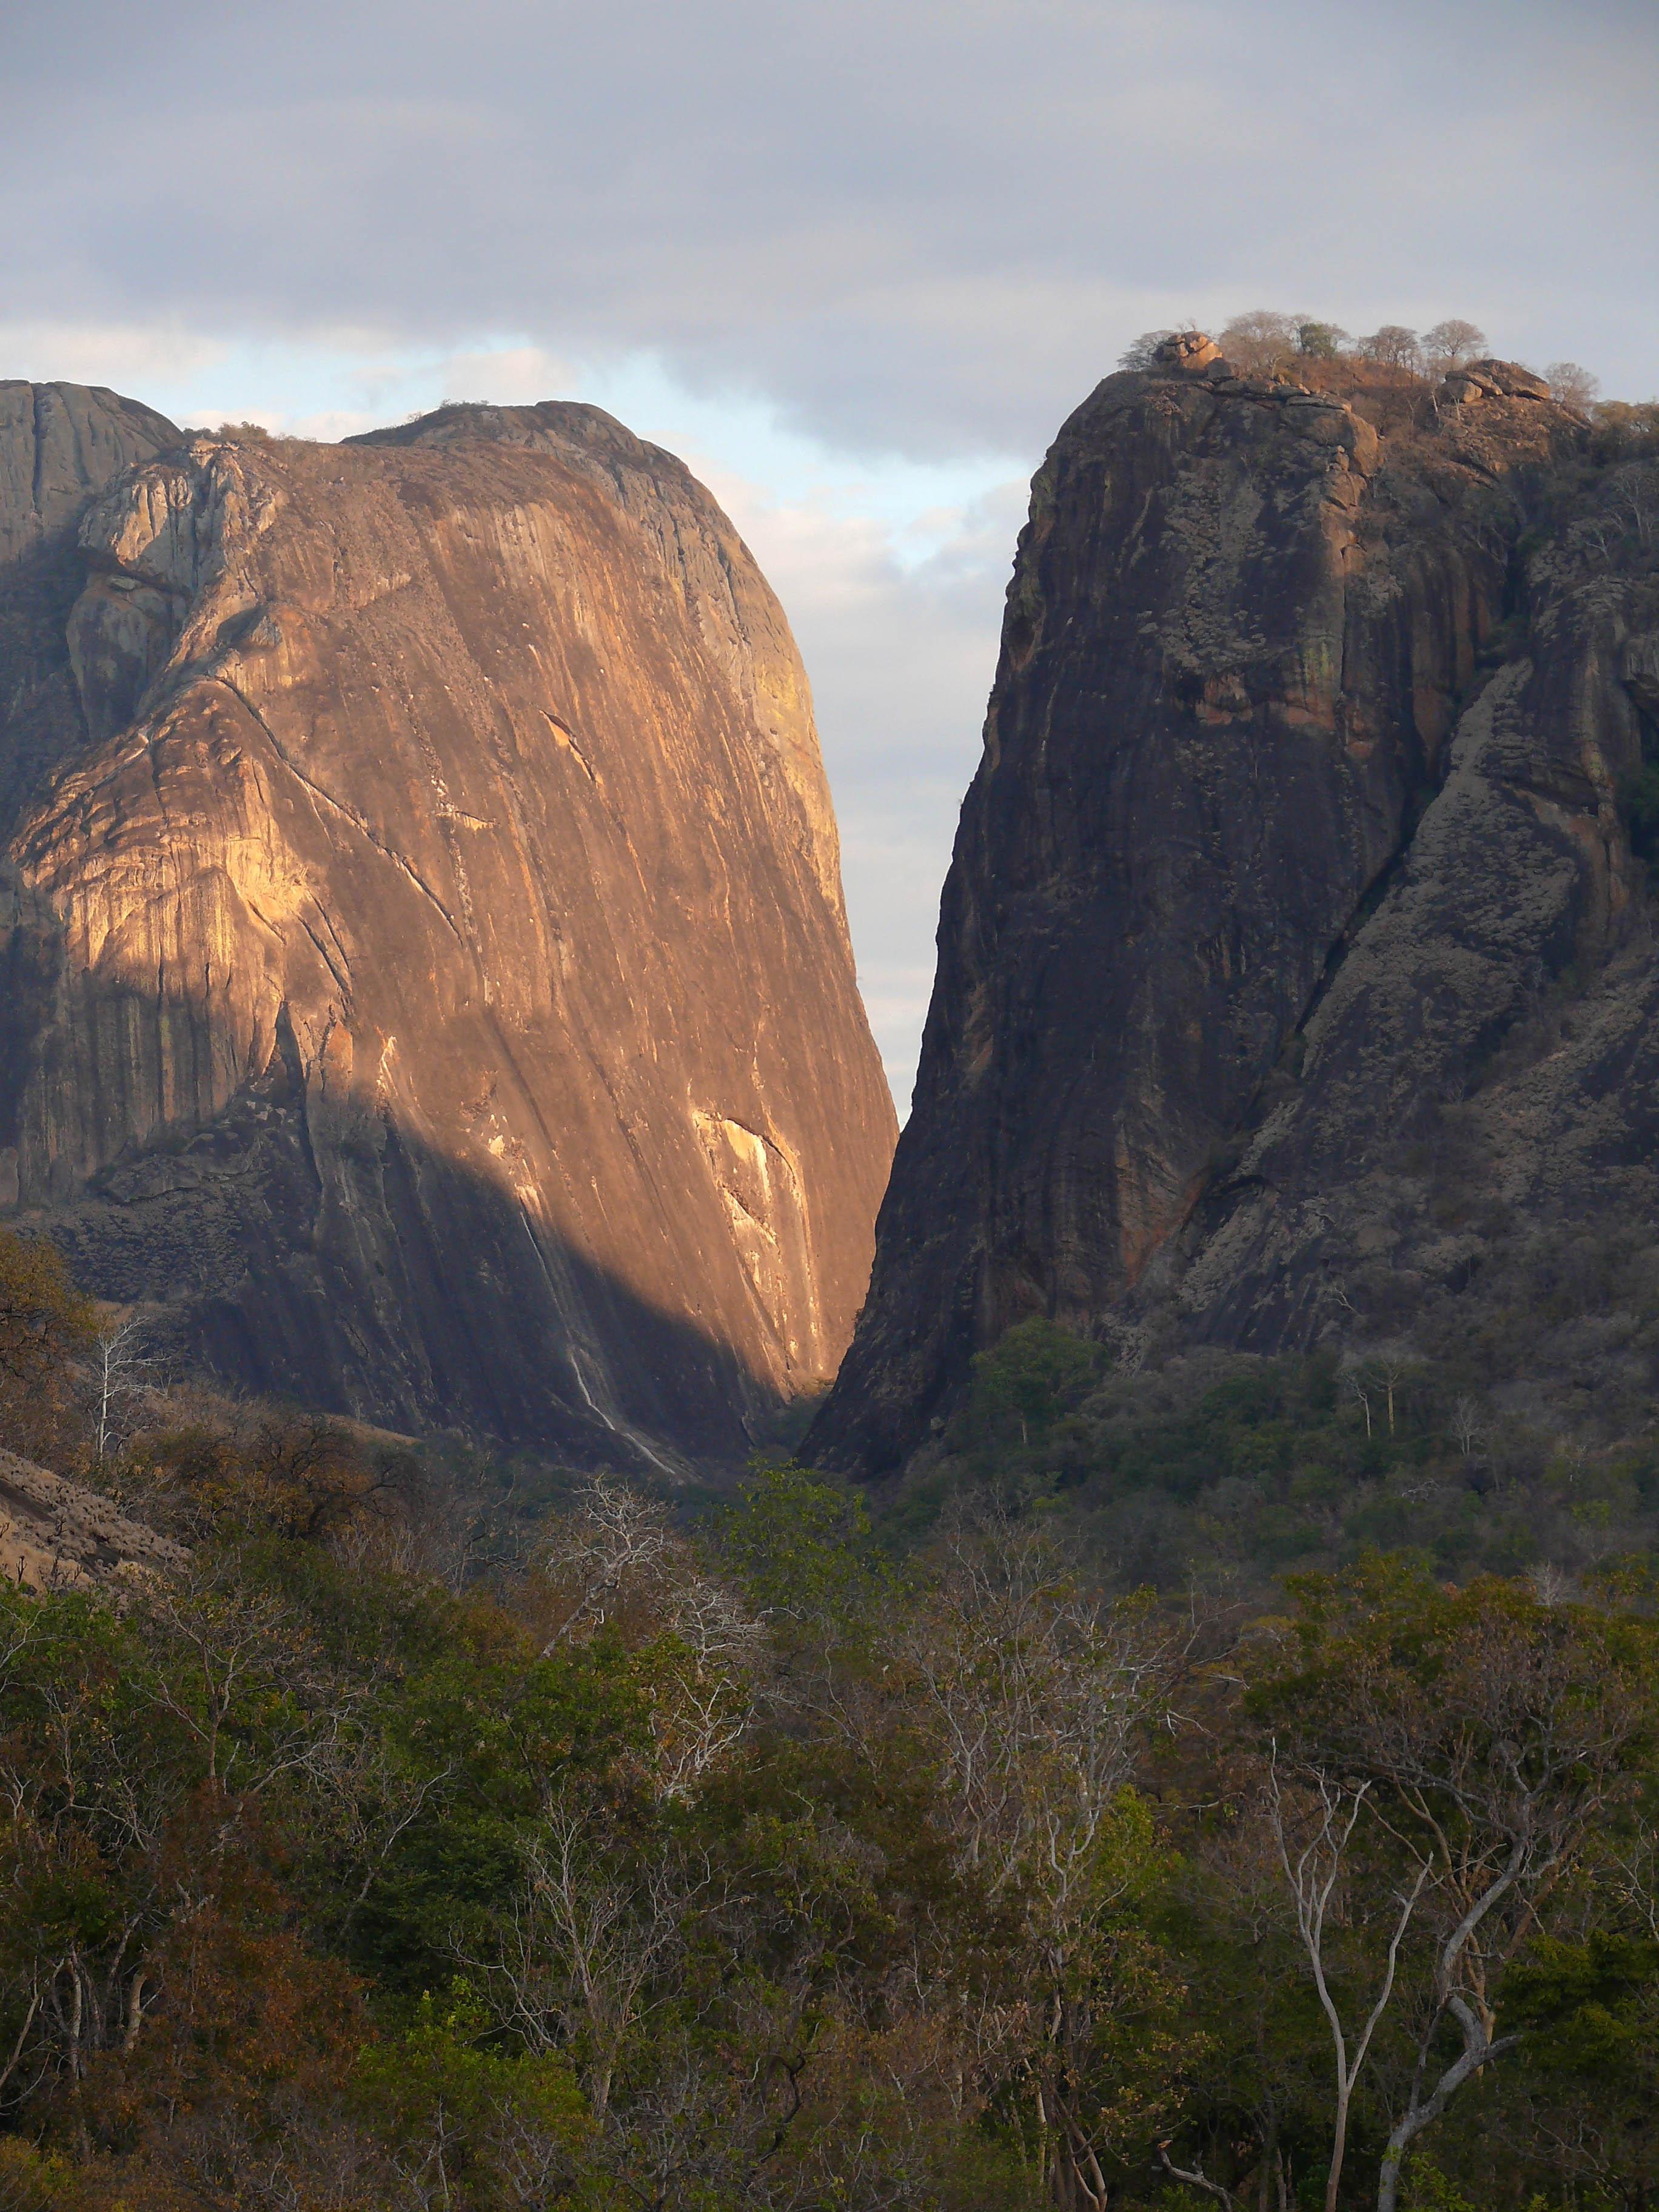 Berge Niassa Nature Reserve tz